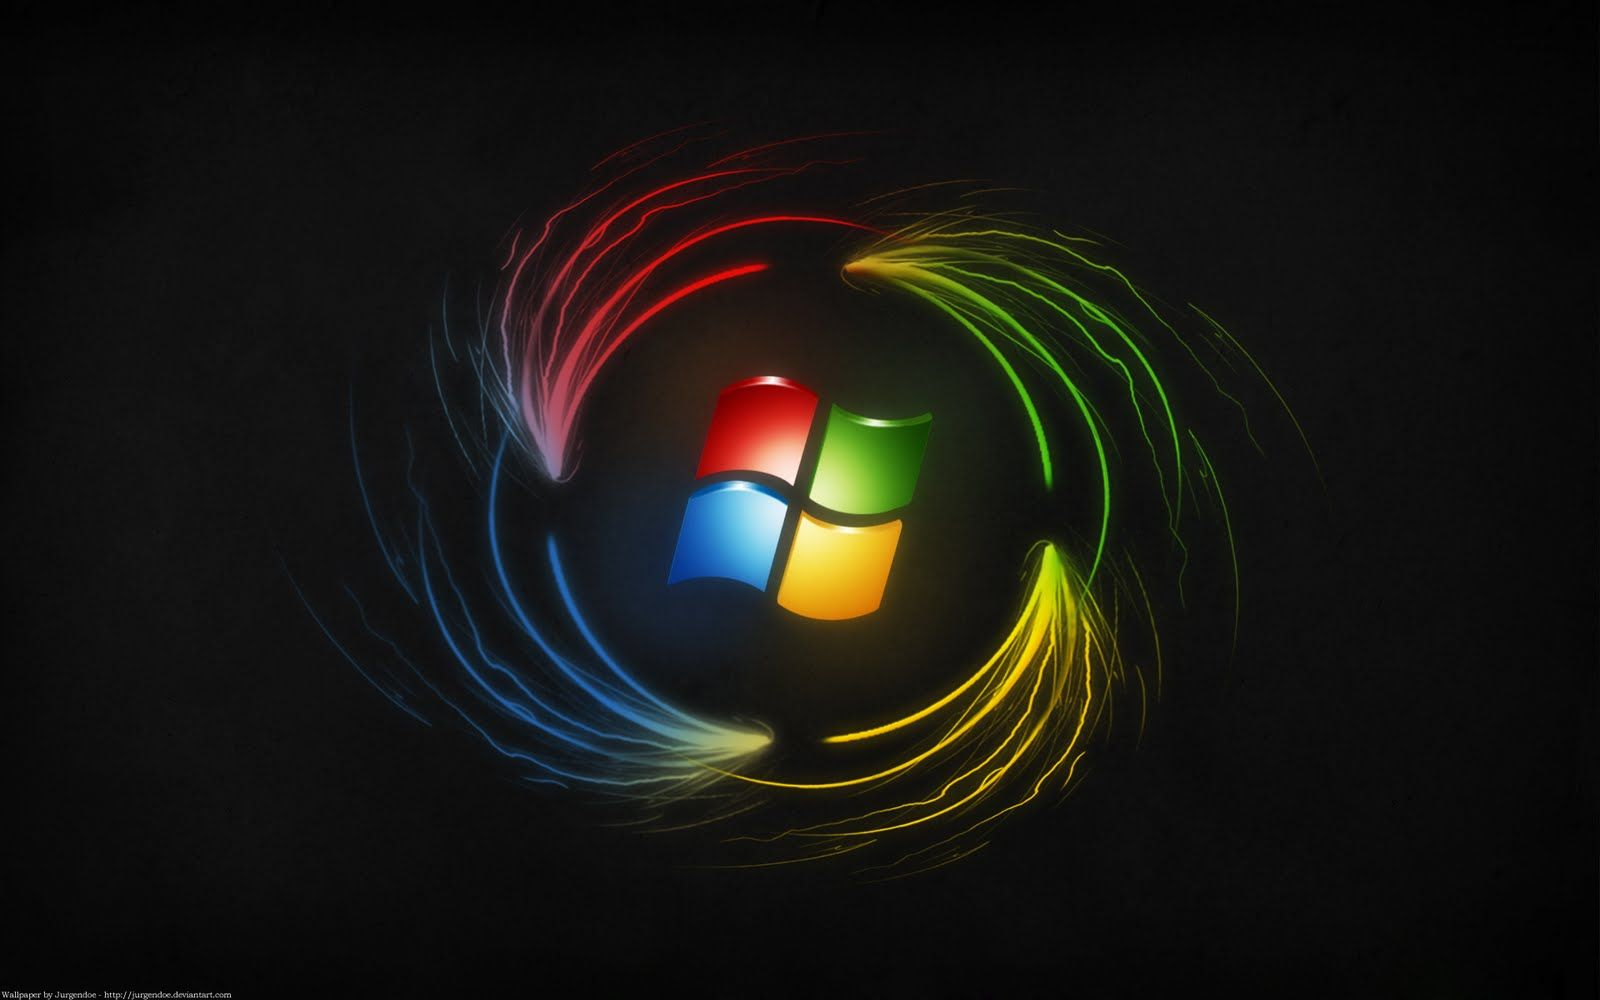 Super Cool Windows 8 Wallpapers HD - http://www ...